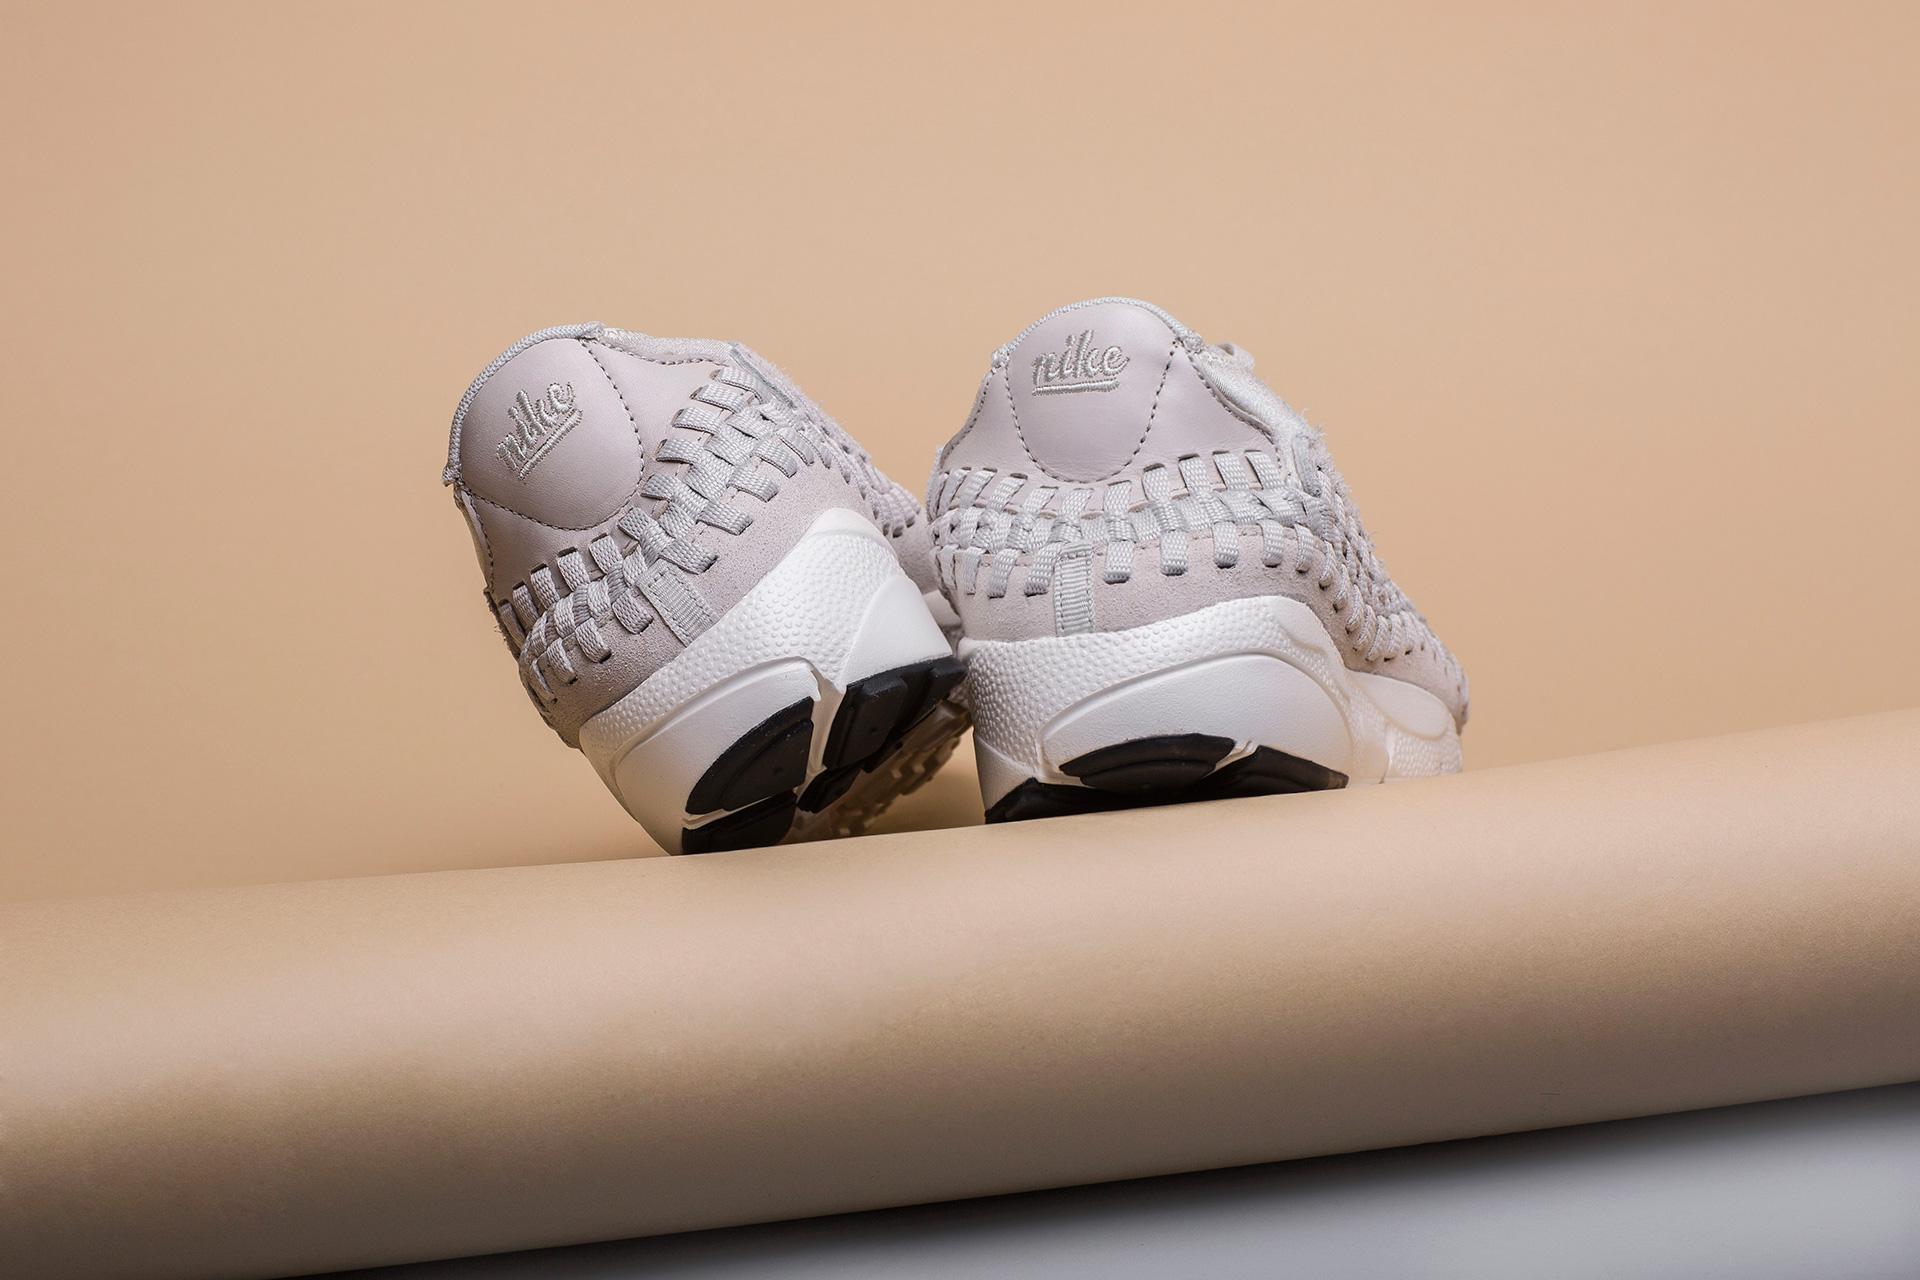 new arrival f82b4 9486c ... Купить мужские бежевыые кроссовки Nike Footscape Woven Chukka QS - фото  2 картинки ...